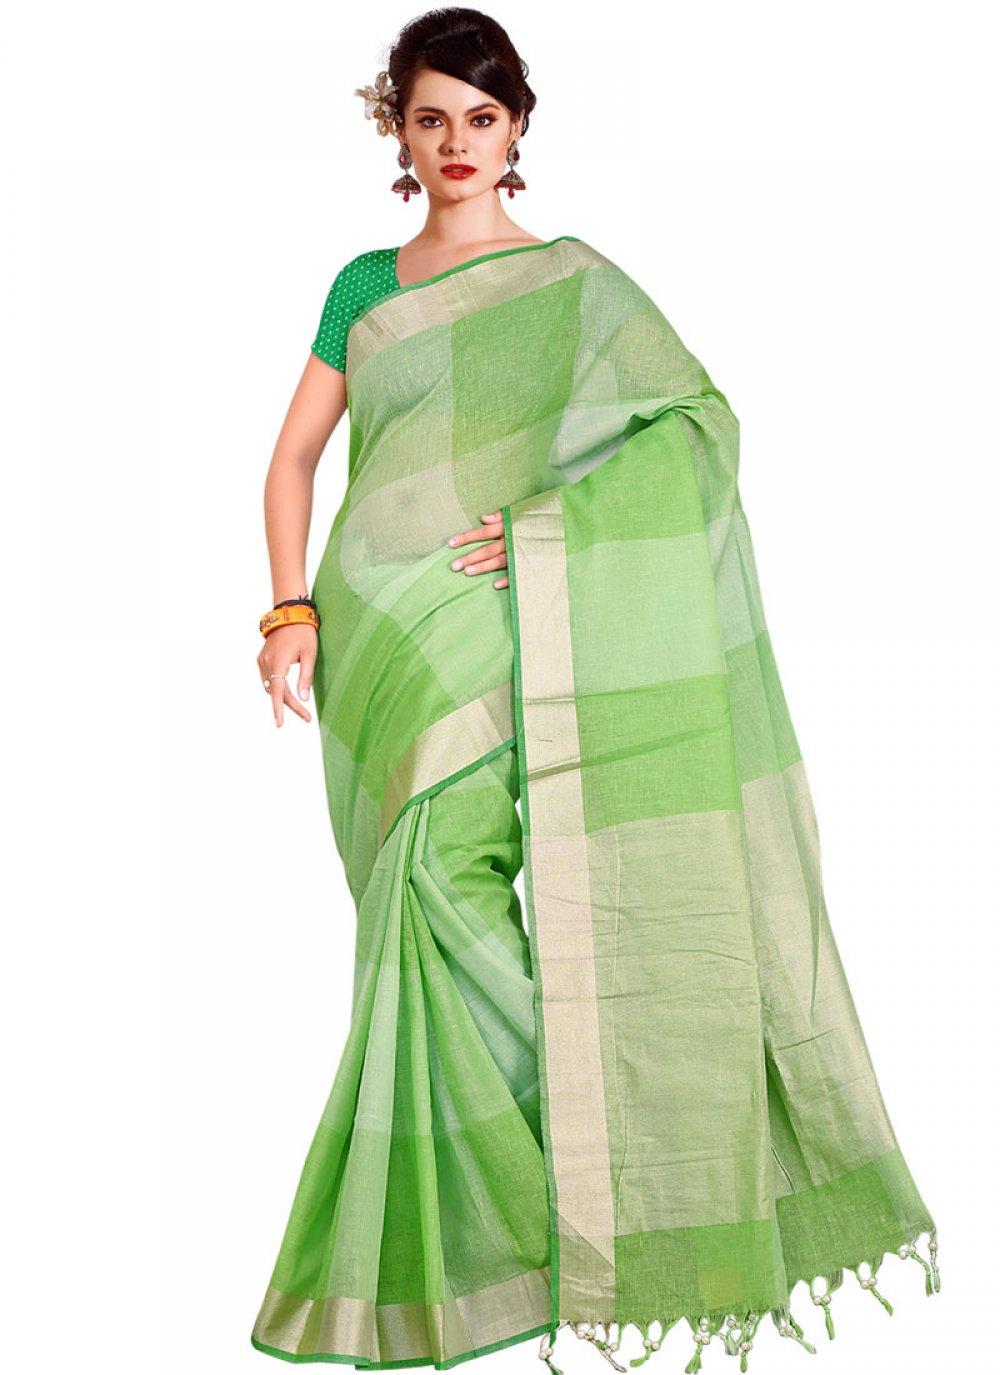 Handloom silk Weaving Designer Traditional Saree in Green